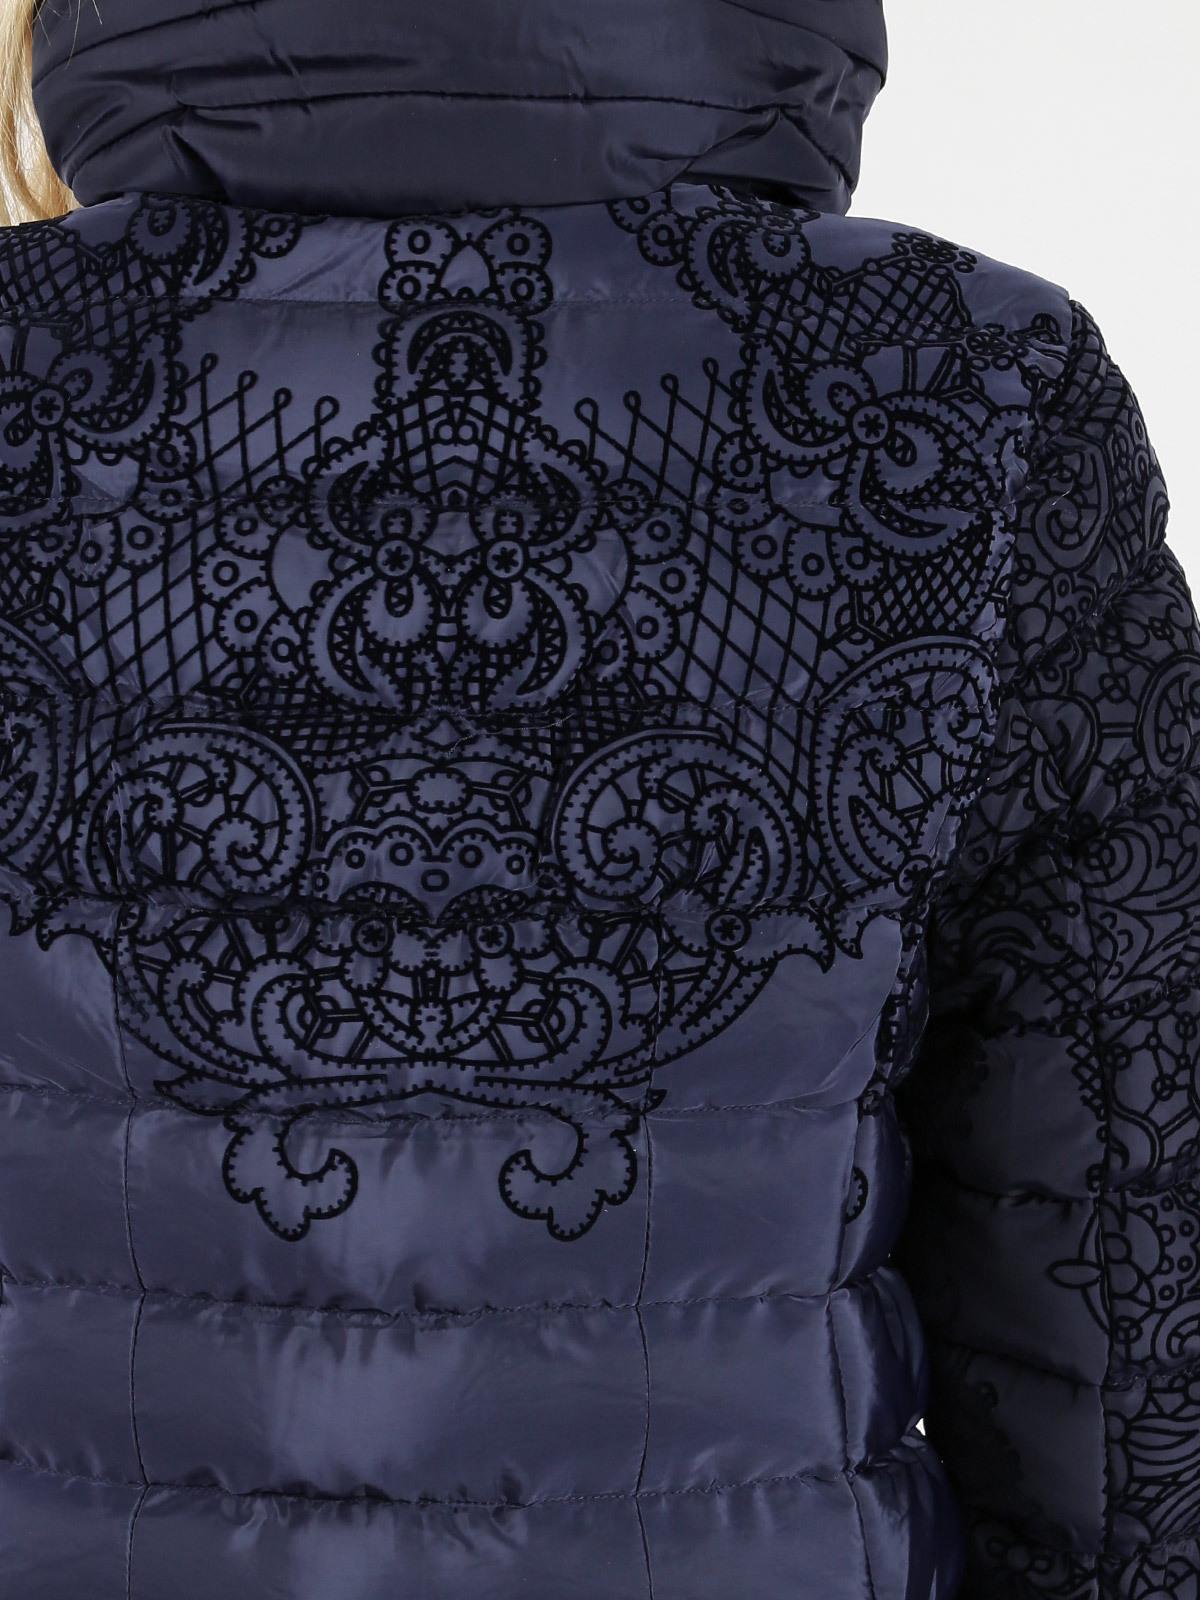 Veste matelassée avec motif en relief bleu ellen rose